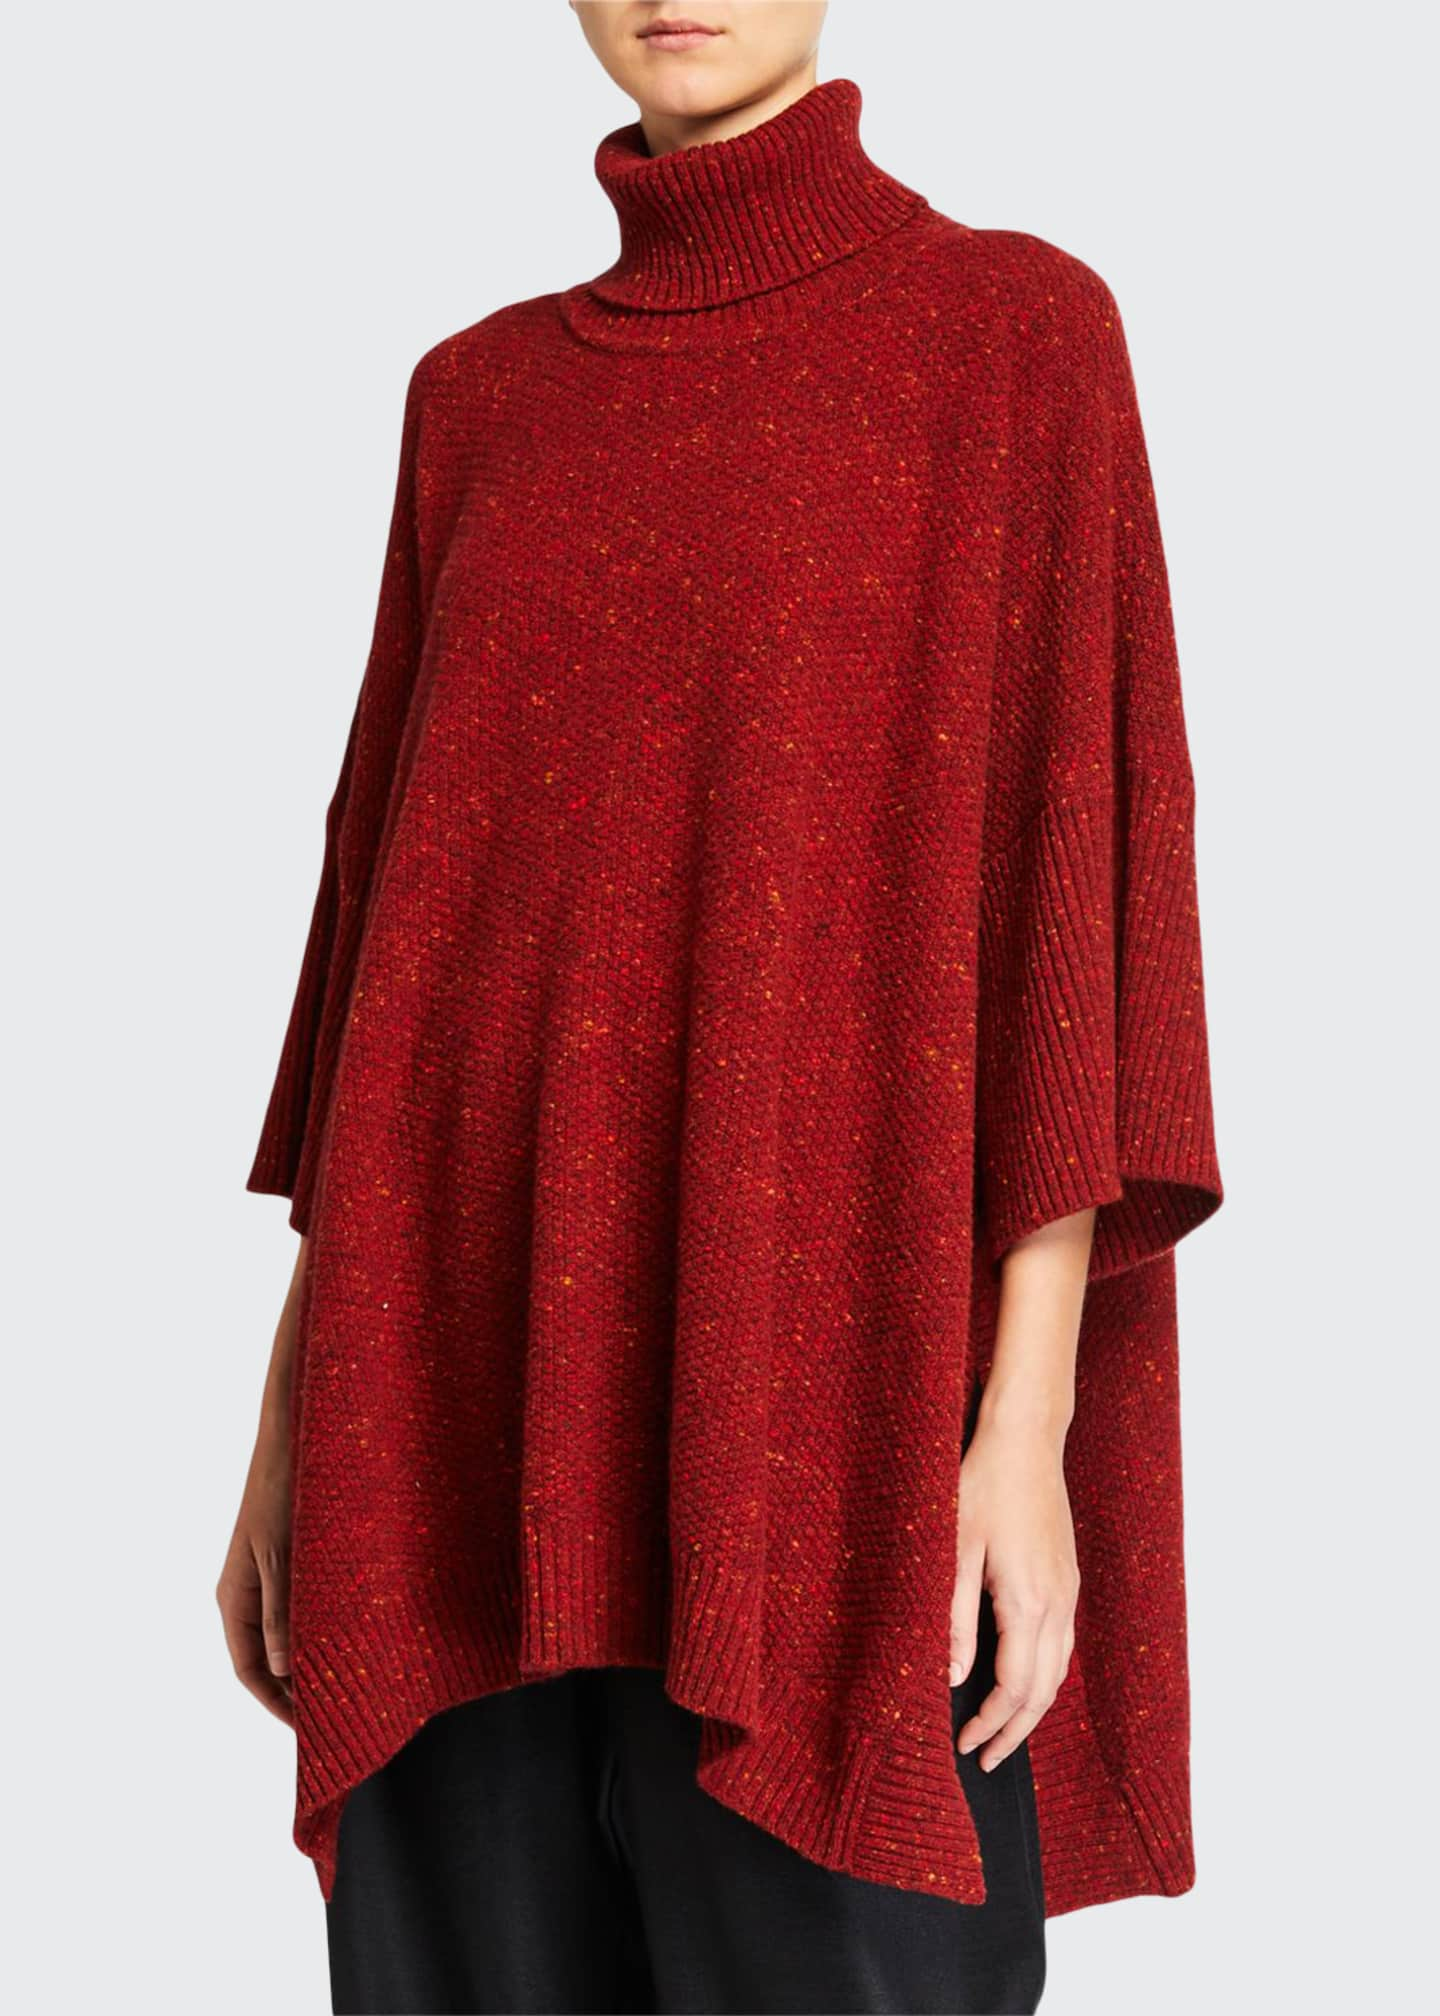 Eskandar Wool-Cashmere 3/4-Sleeve Rolled-Neck Poncho